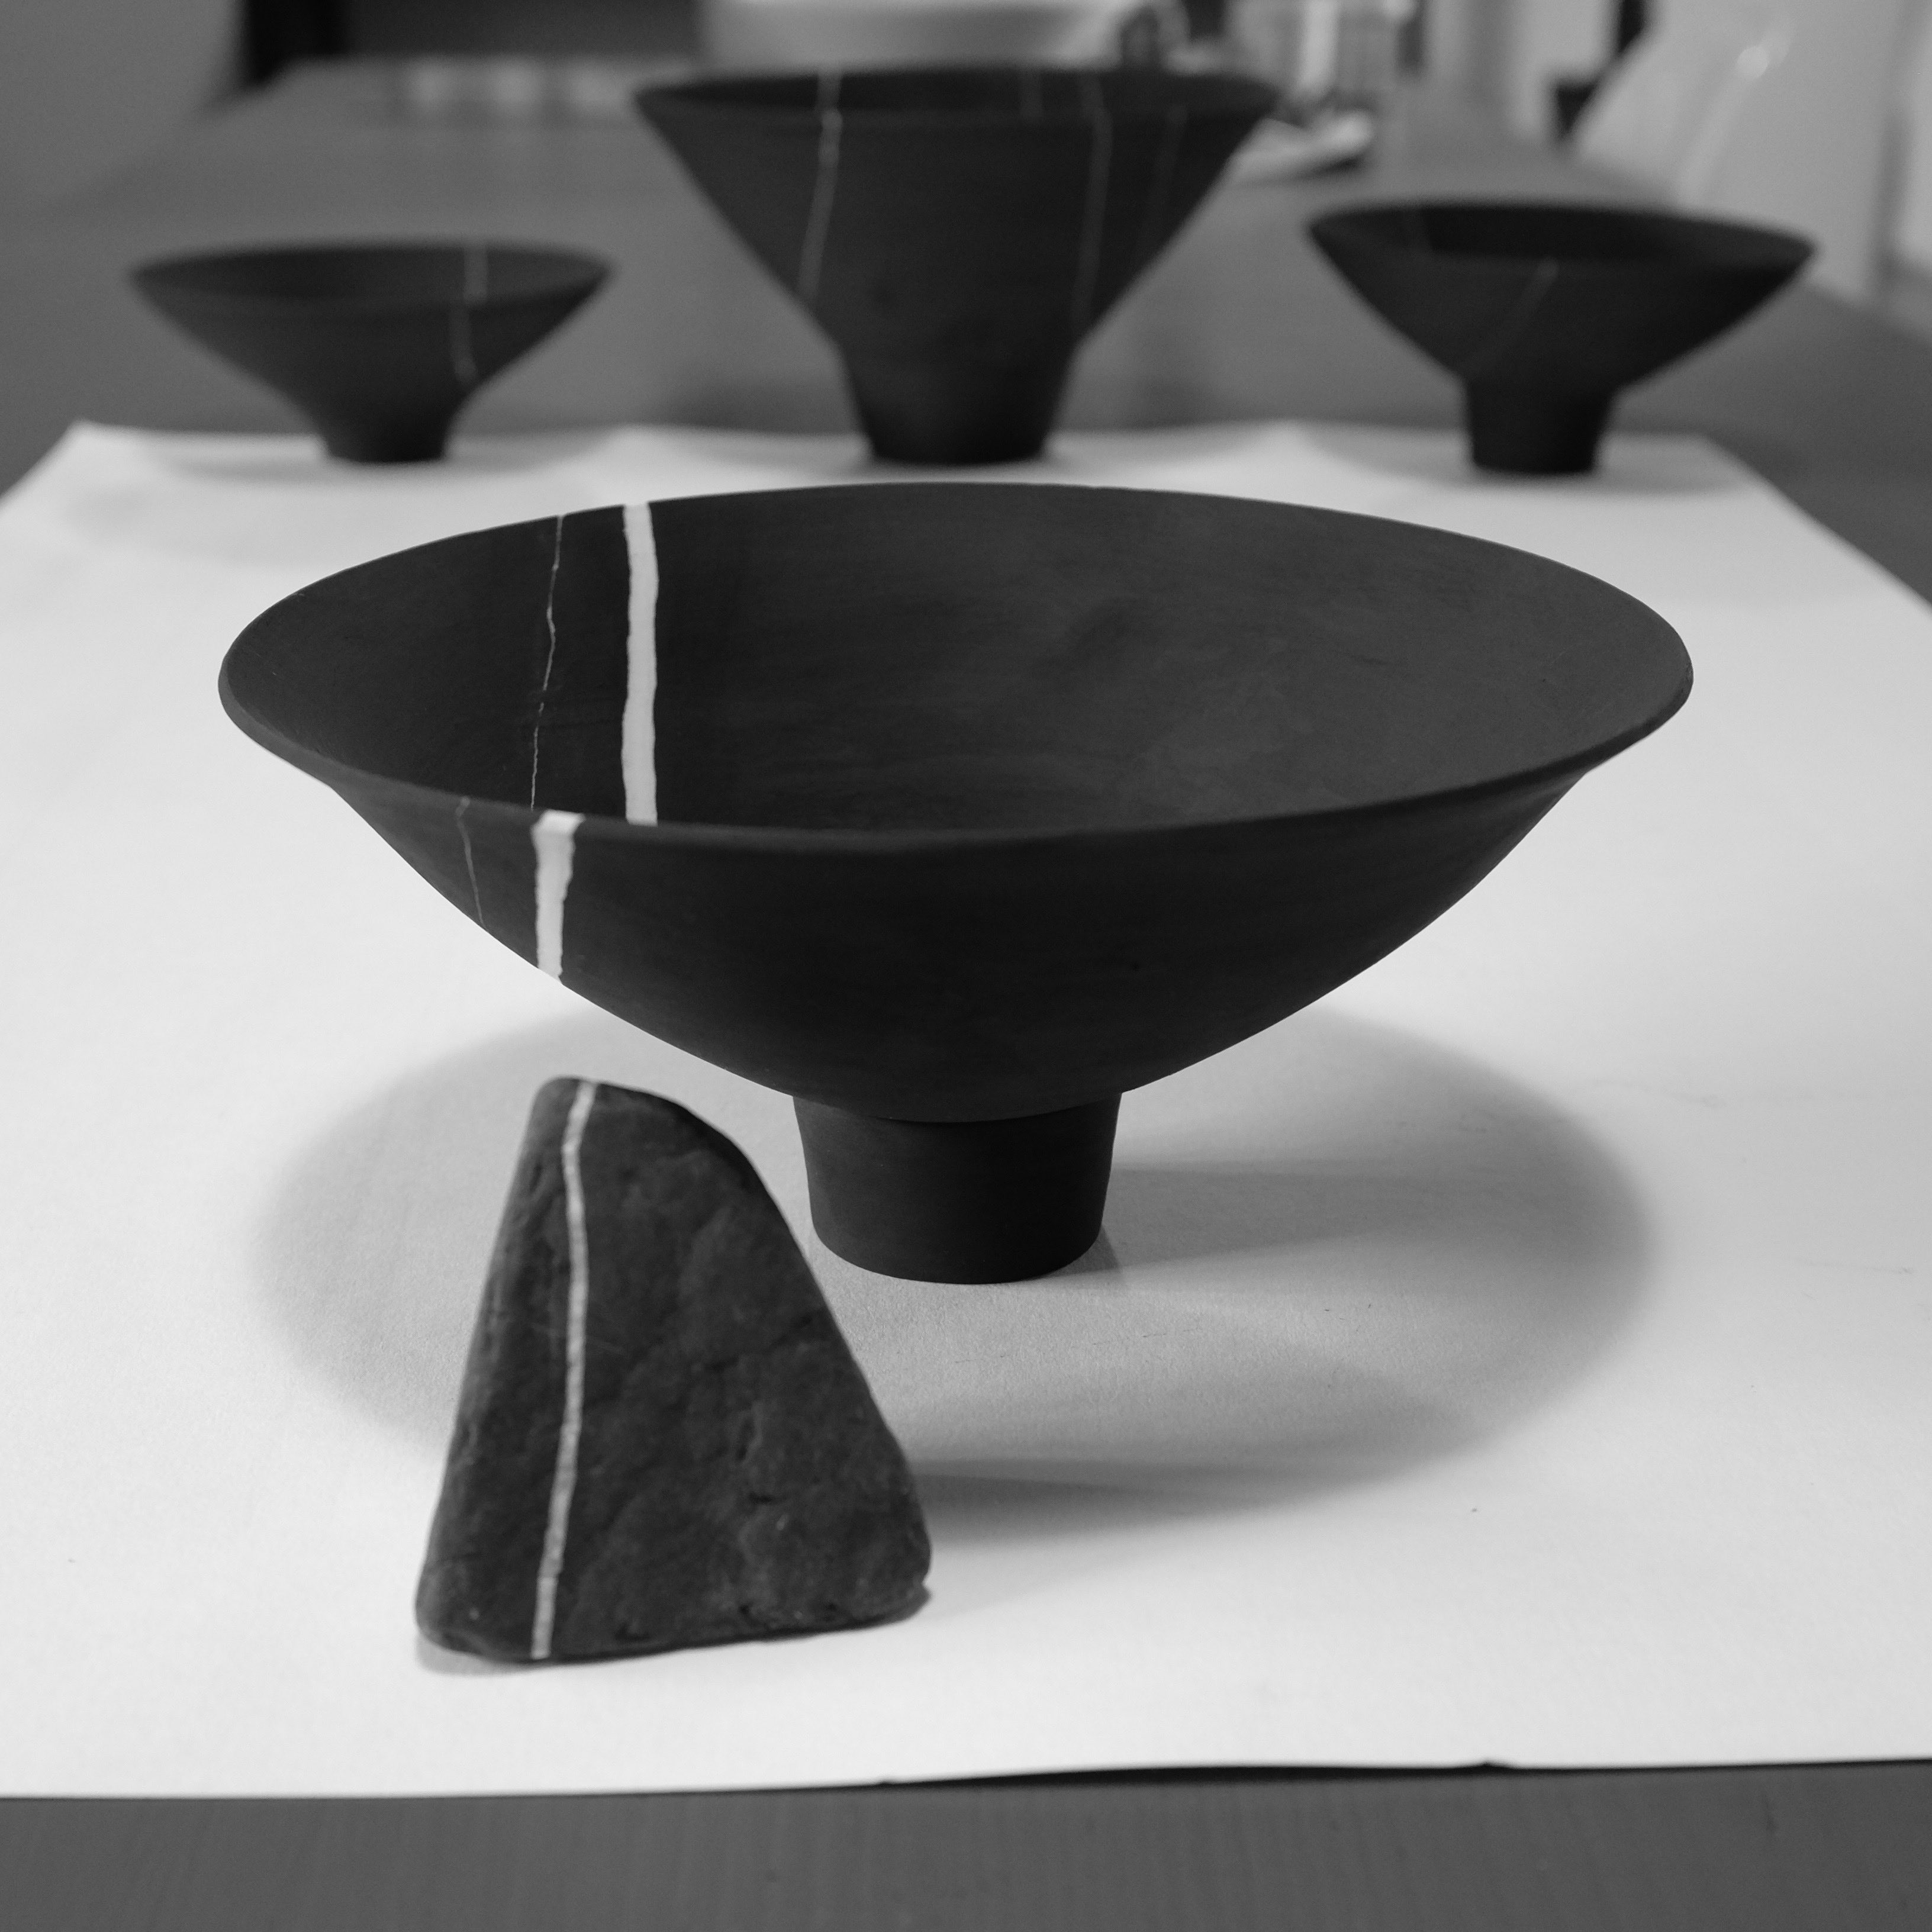 Strata bowl and stone